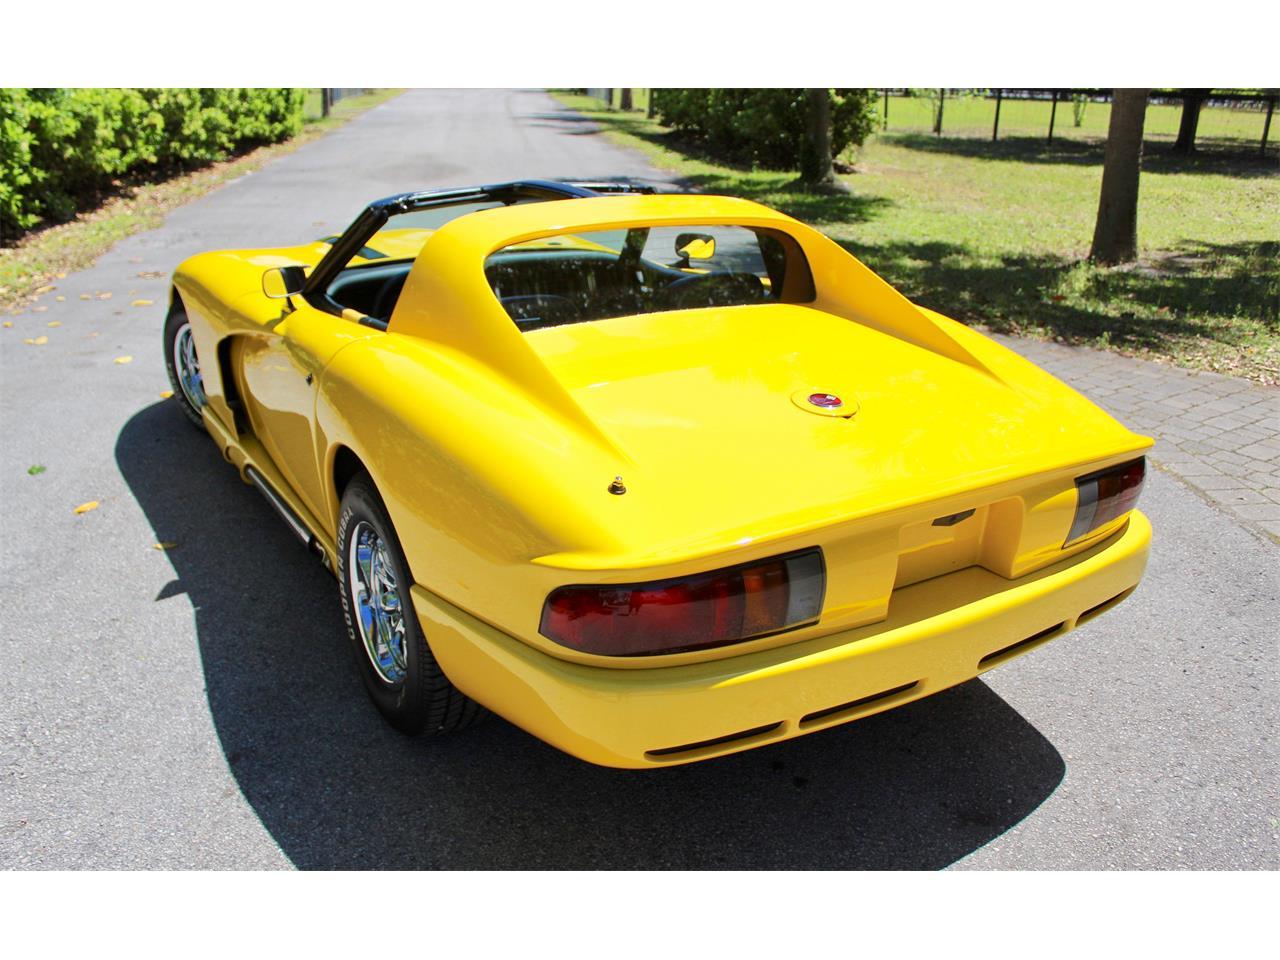 1976 Chevrolet Corvette (CC-1204533) for sale in Eustis, Florida